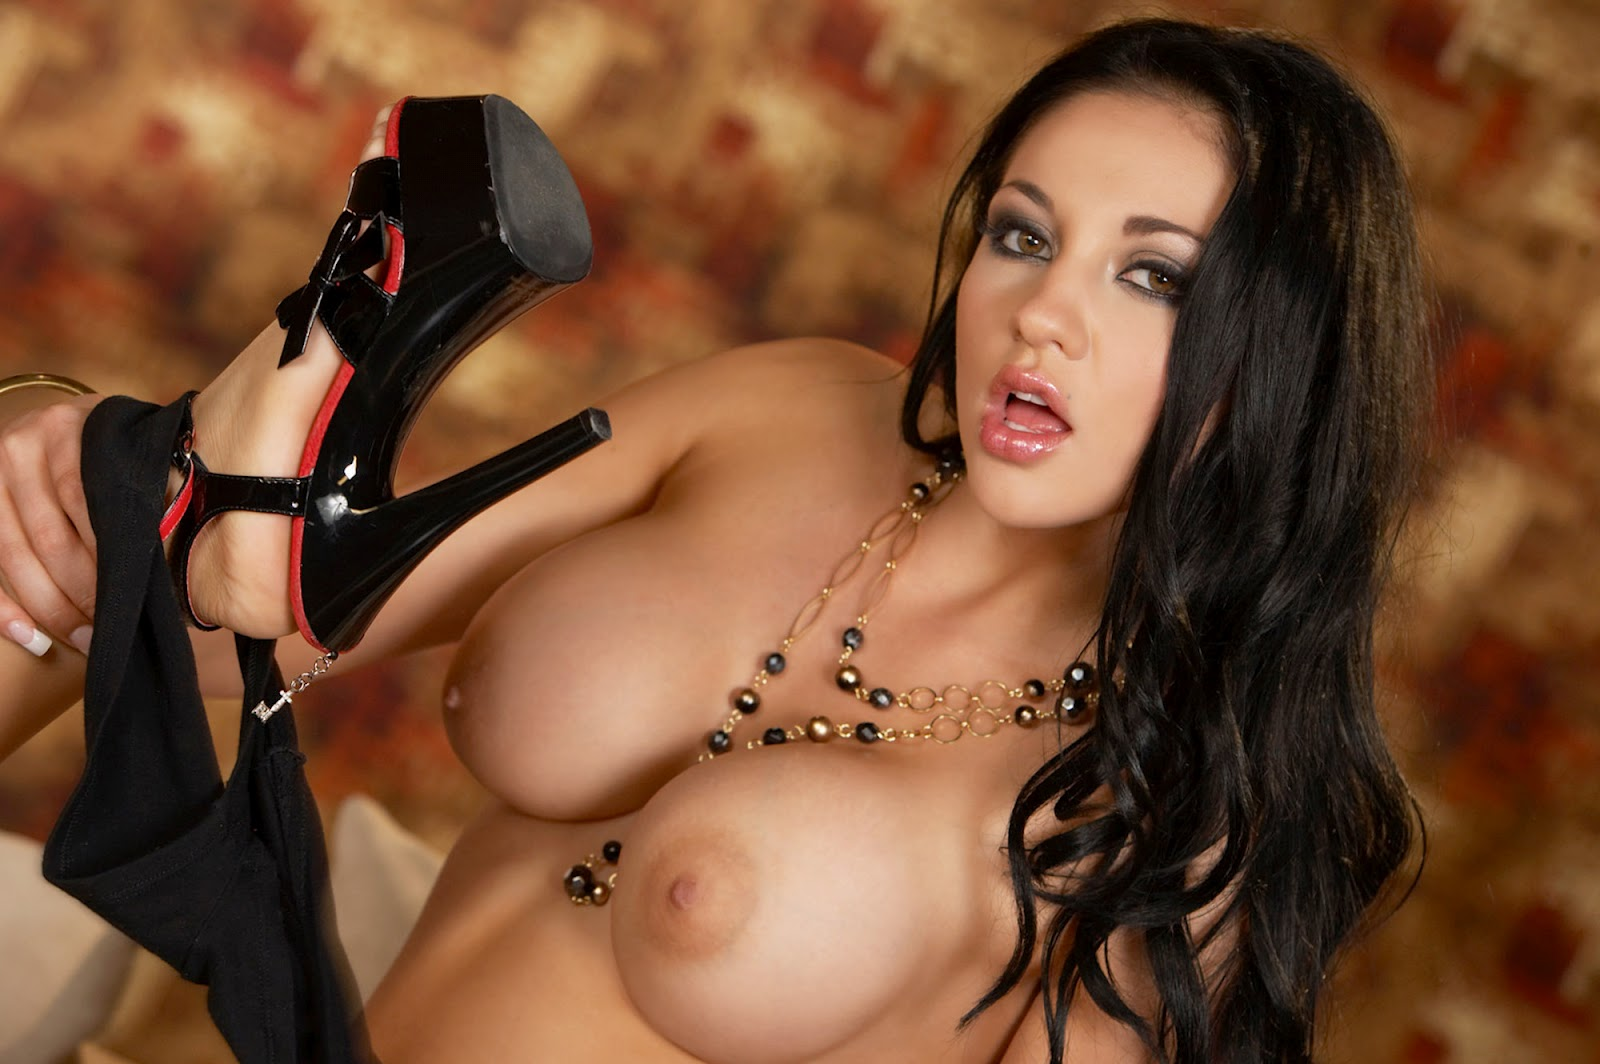 http://1.bp.blogspot.com/-bj5LRBmRu6g/UAvRHzawqmI/AAAAAAAAGUg/6_dvaPYOUF4/s1600/Eva+Angelina_Free_High_Quality_1920x1200_Wallpapers_For_Your_Desktop_02319191%2825.07.2011%29.jpg